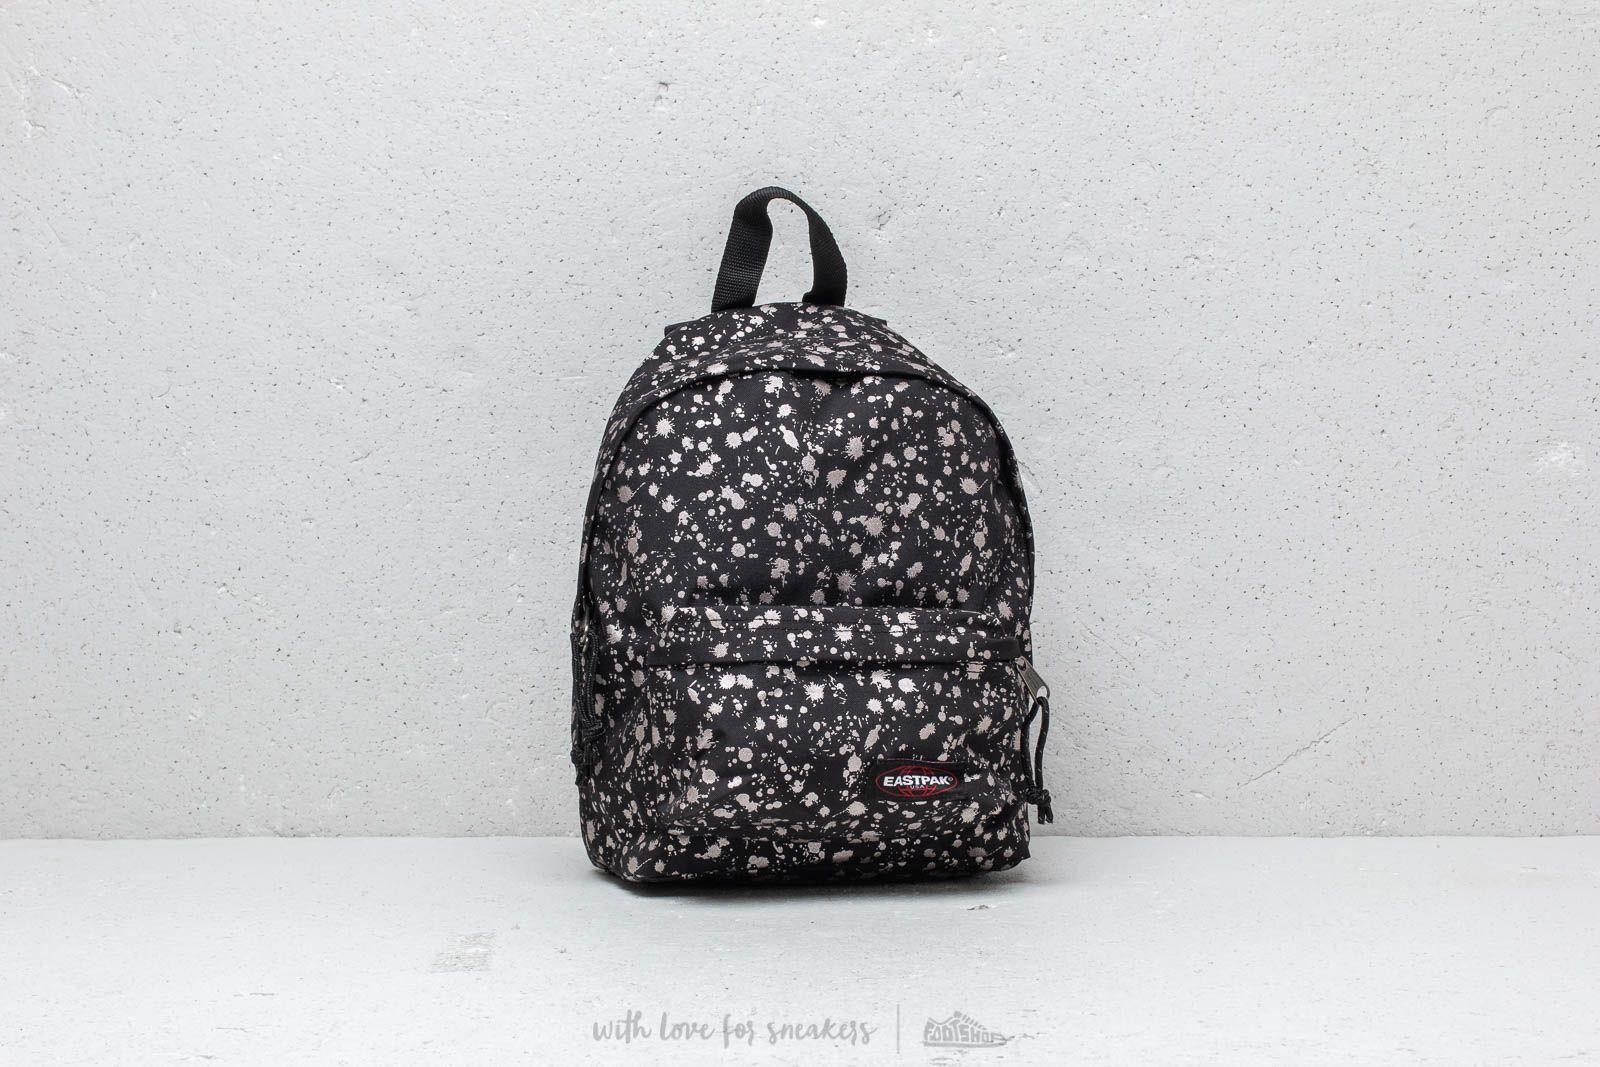 Eastpak Orbit Backpack Silver Mist za skvelú cenu 36 € kúpite na Footshop.sk